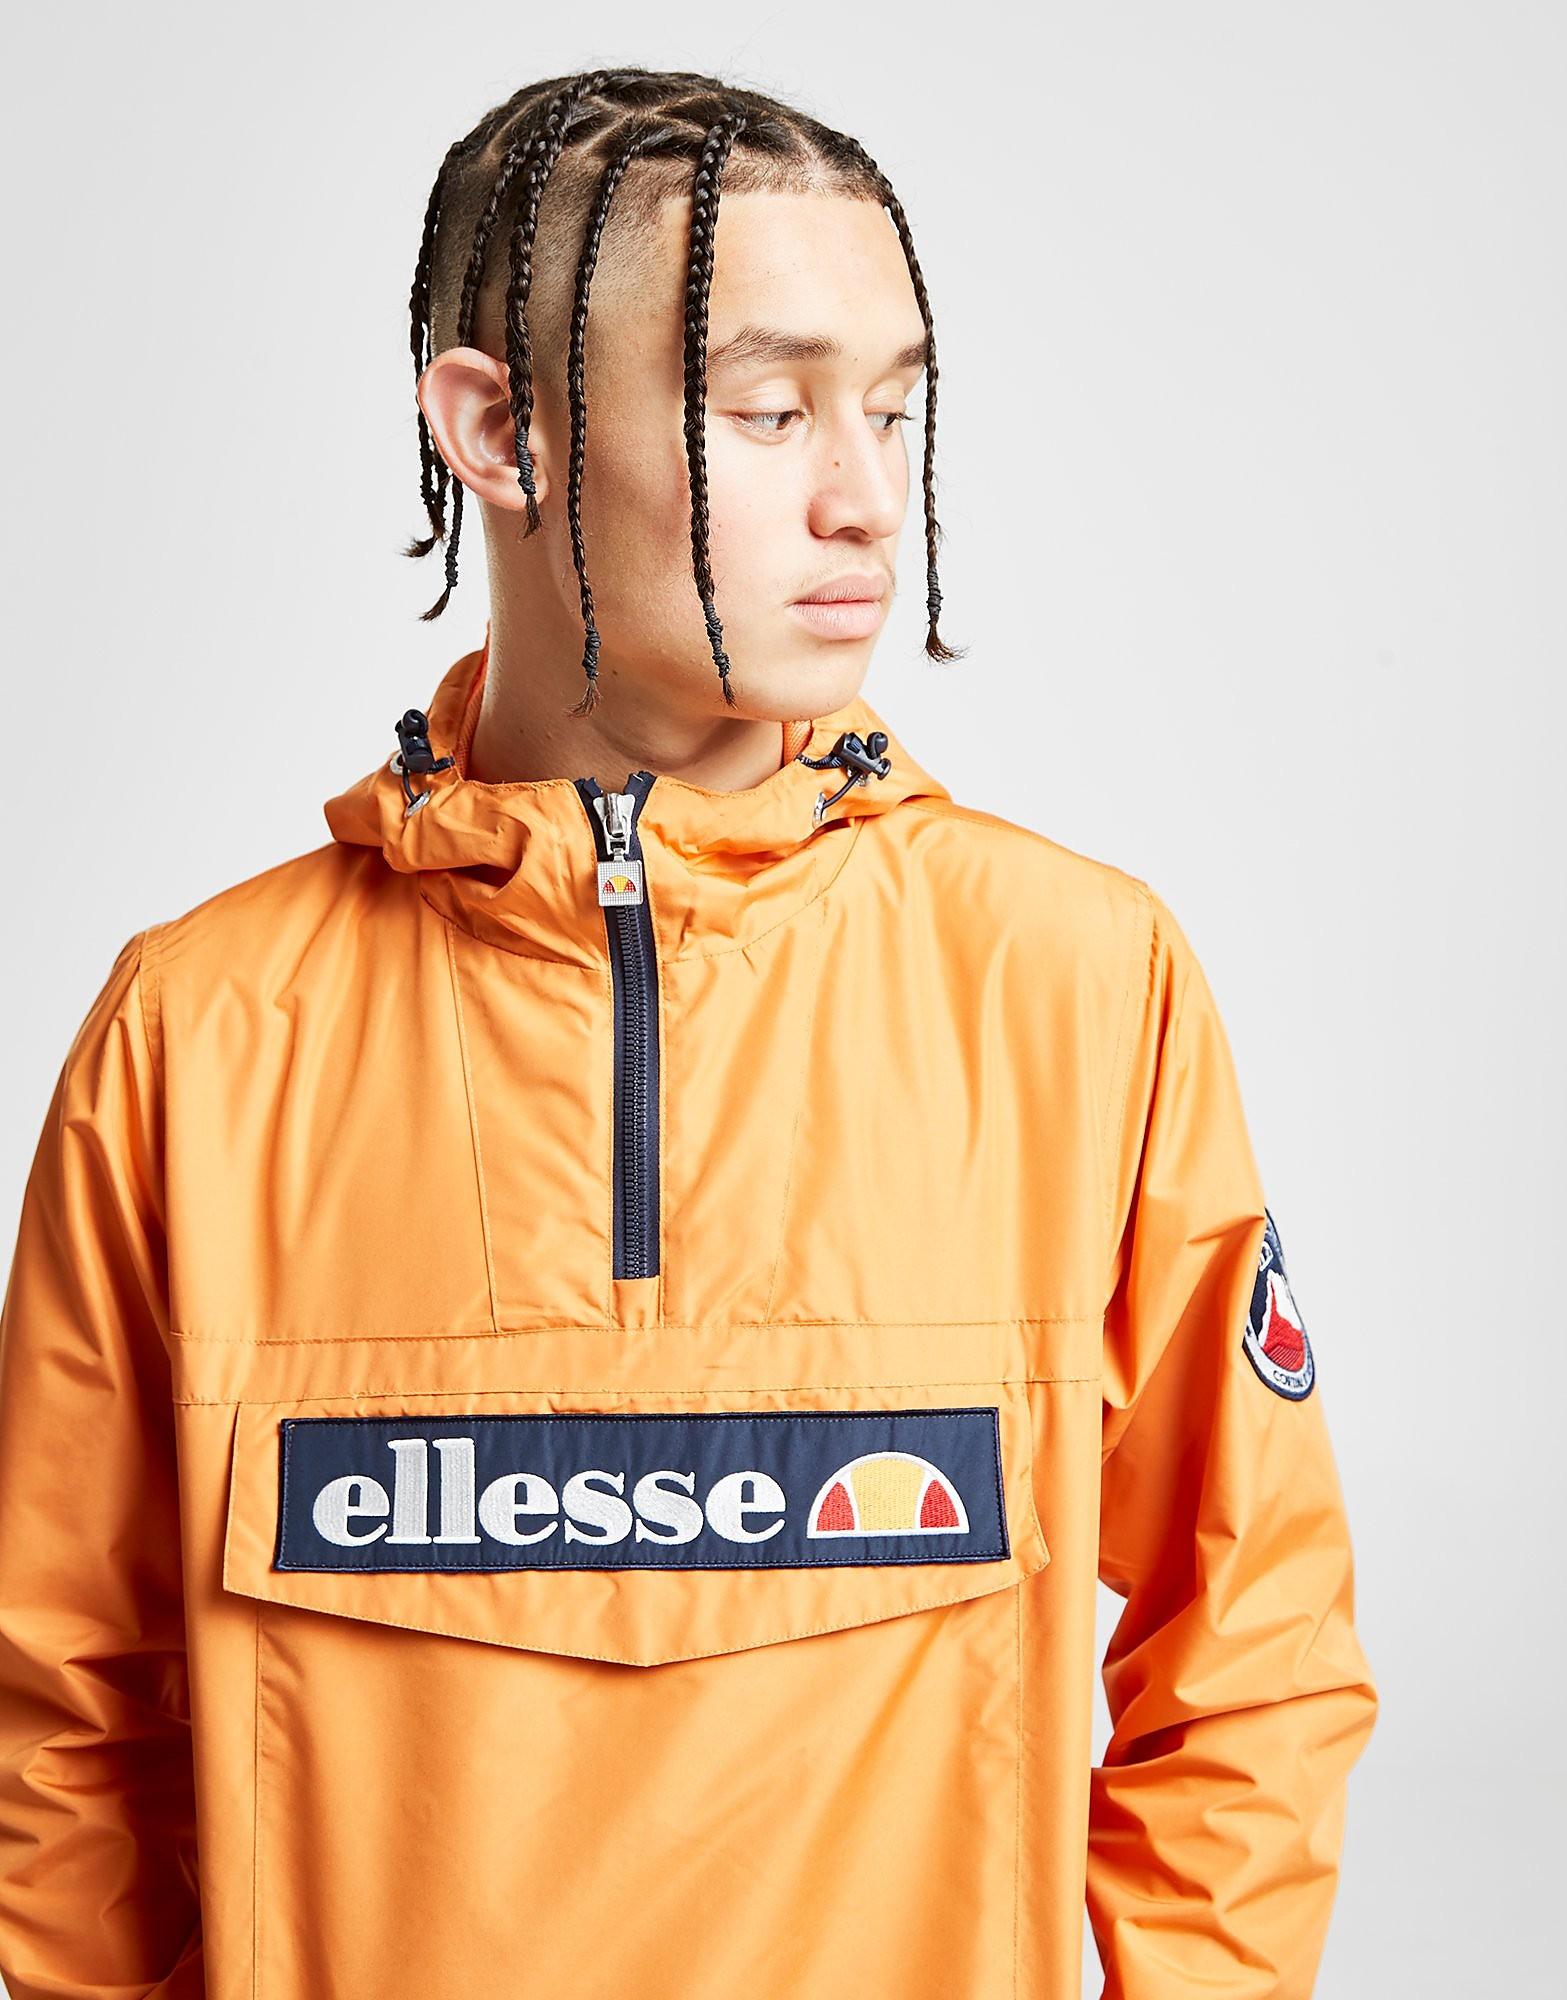 Ellesse Monaria Jacket - Oranje - Heren